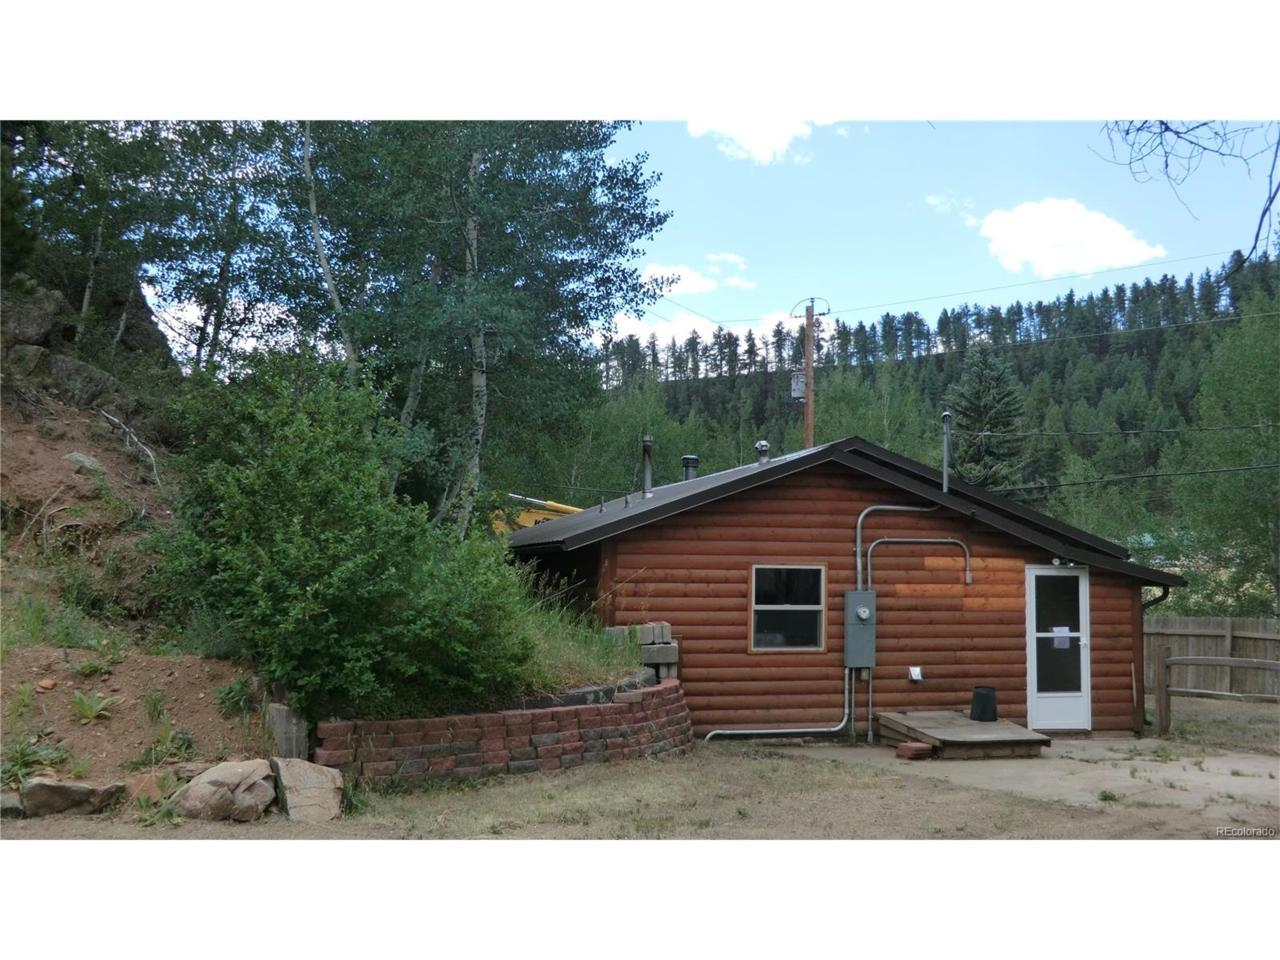 57837 Hwy 285, Bailey, CO 80421 (MLS #3904337) :: 8z Real Estate